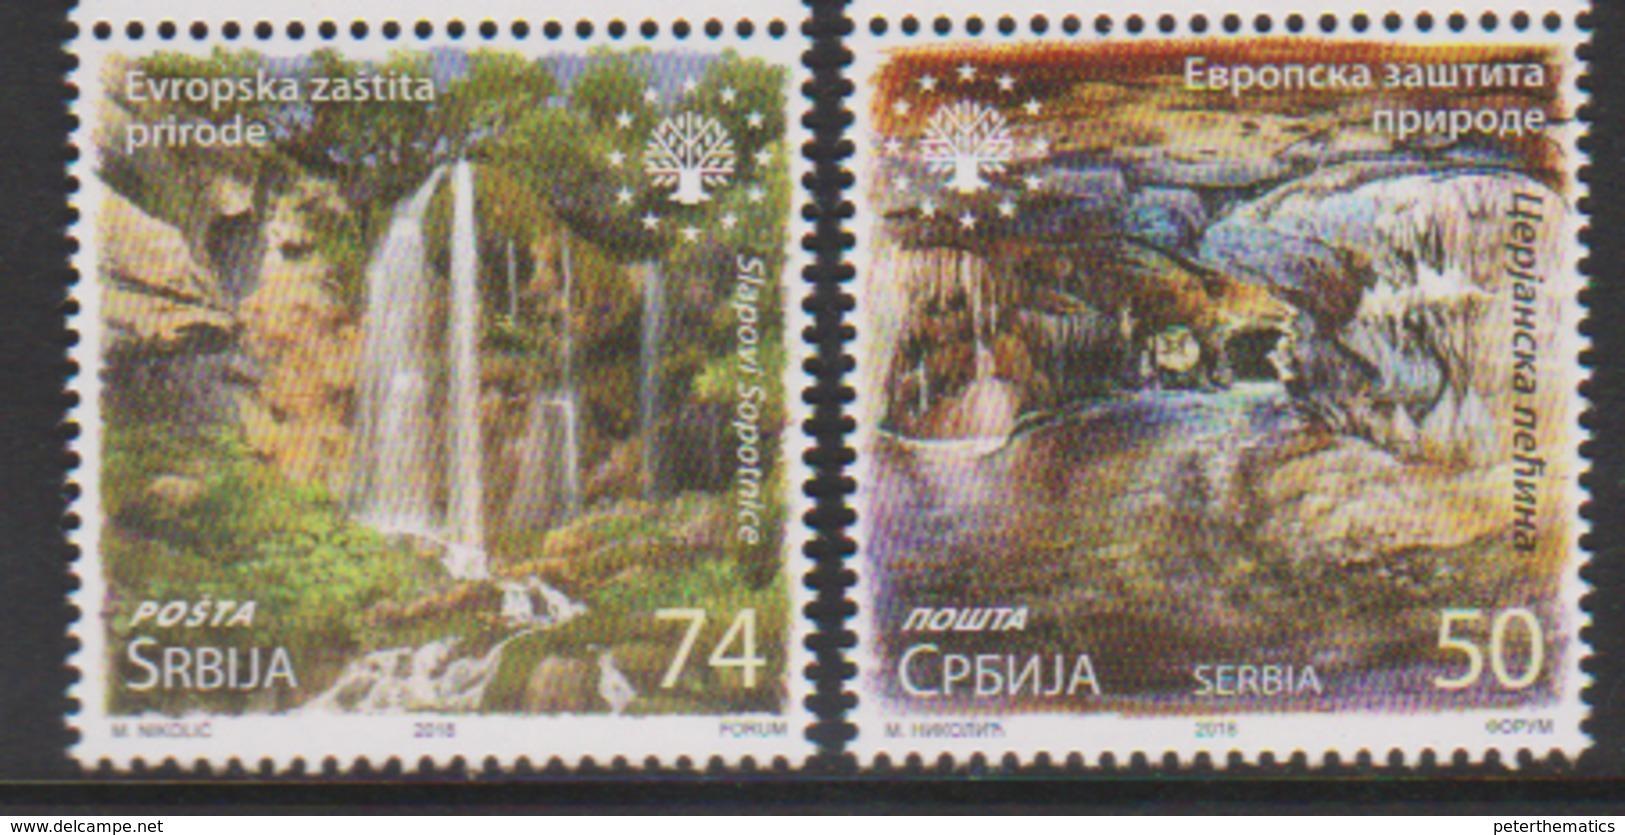 SERBIA, 2018,MNH, EUROPEAN NATURE PROTECTION, WATERFALLS, CAVES, 2v - Geology